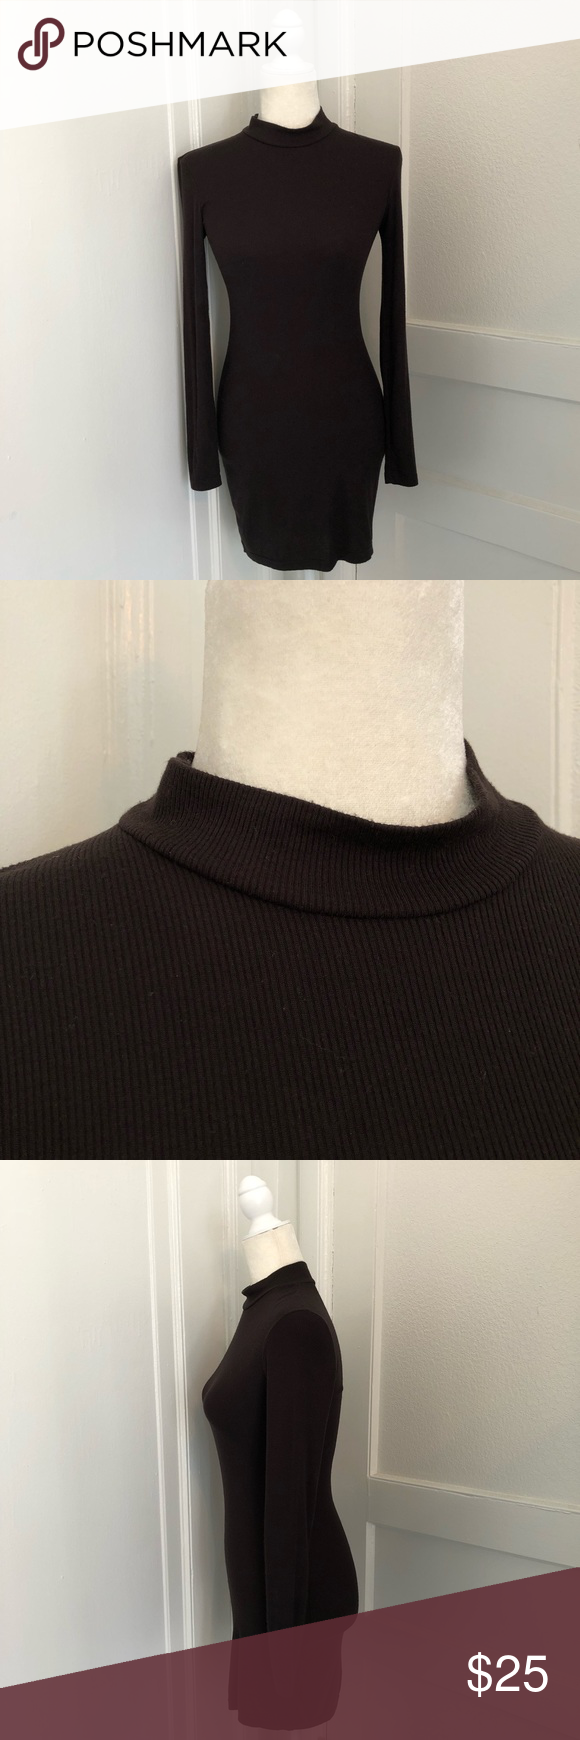 American apparel ribbed mock turtleneck dress